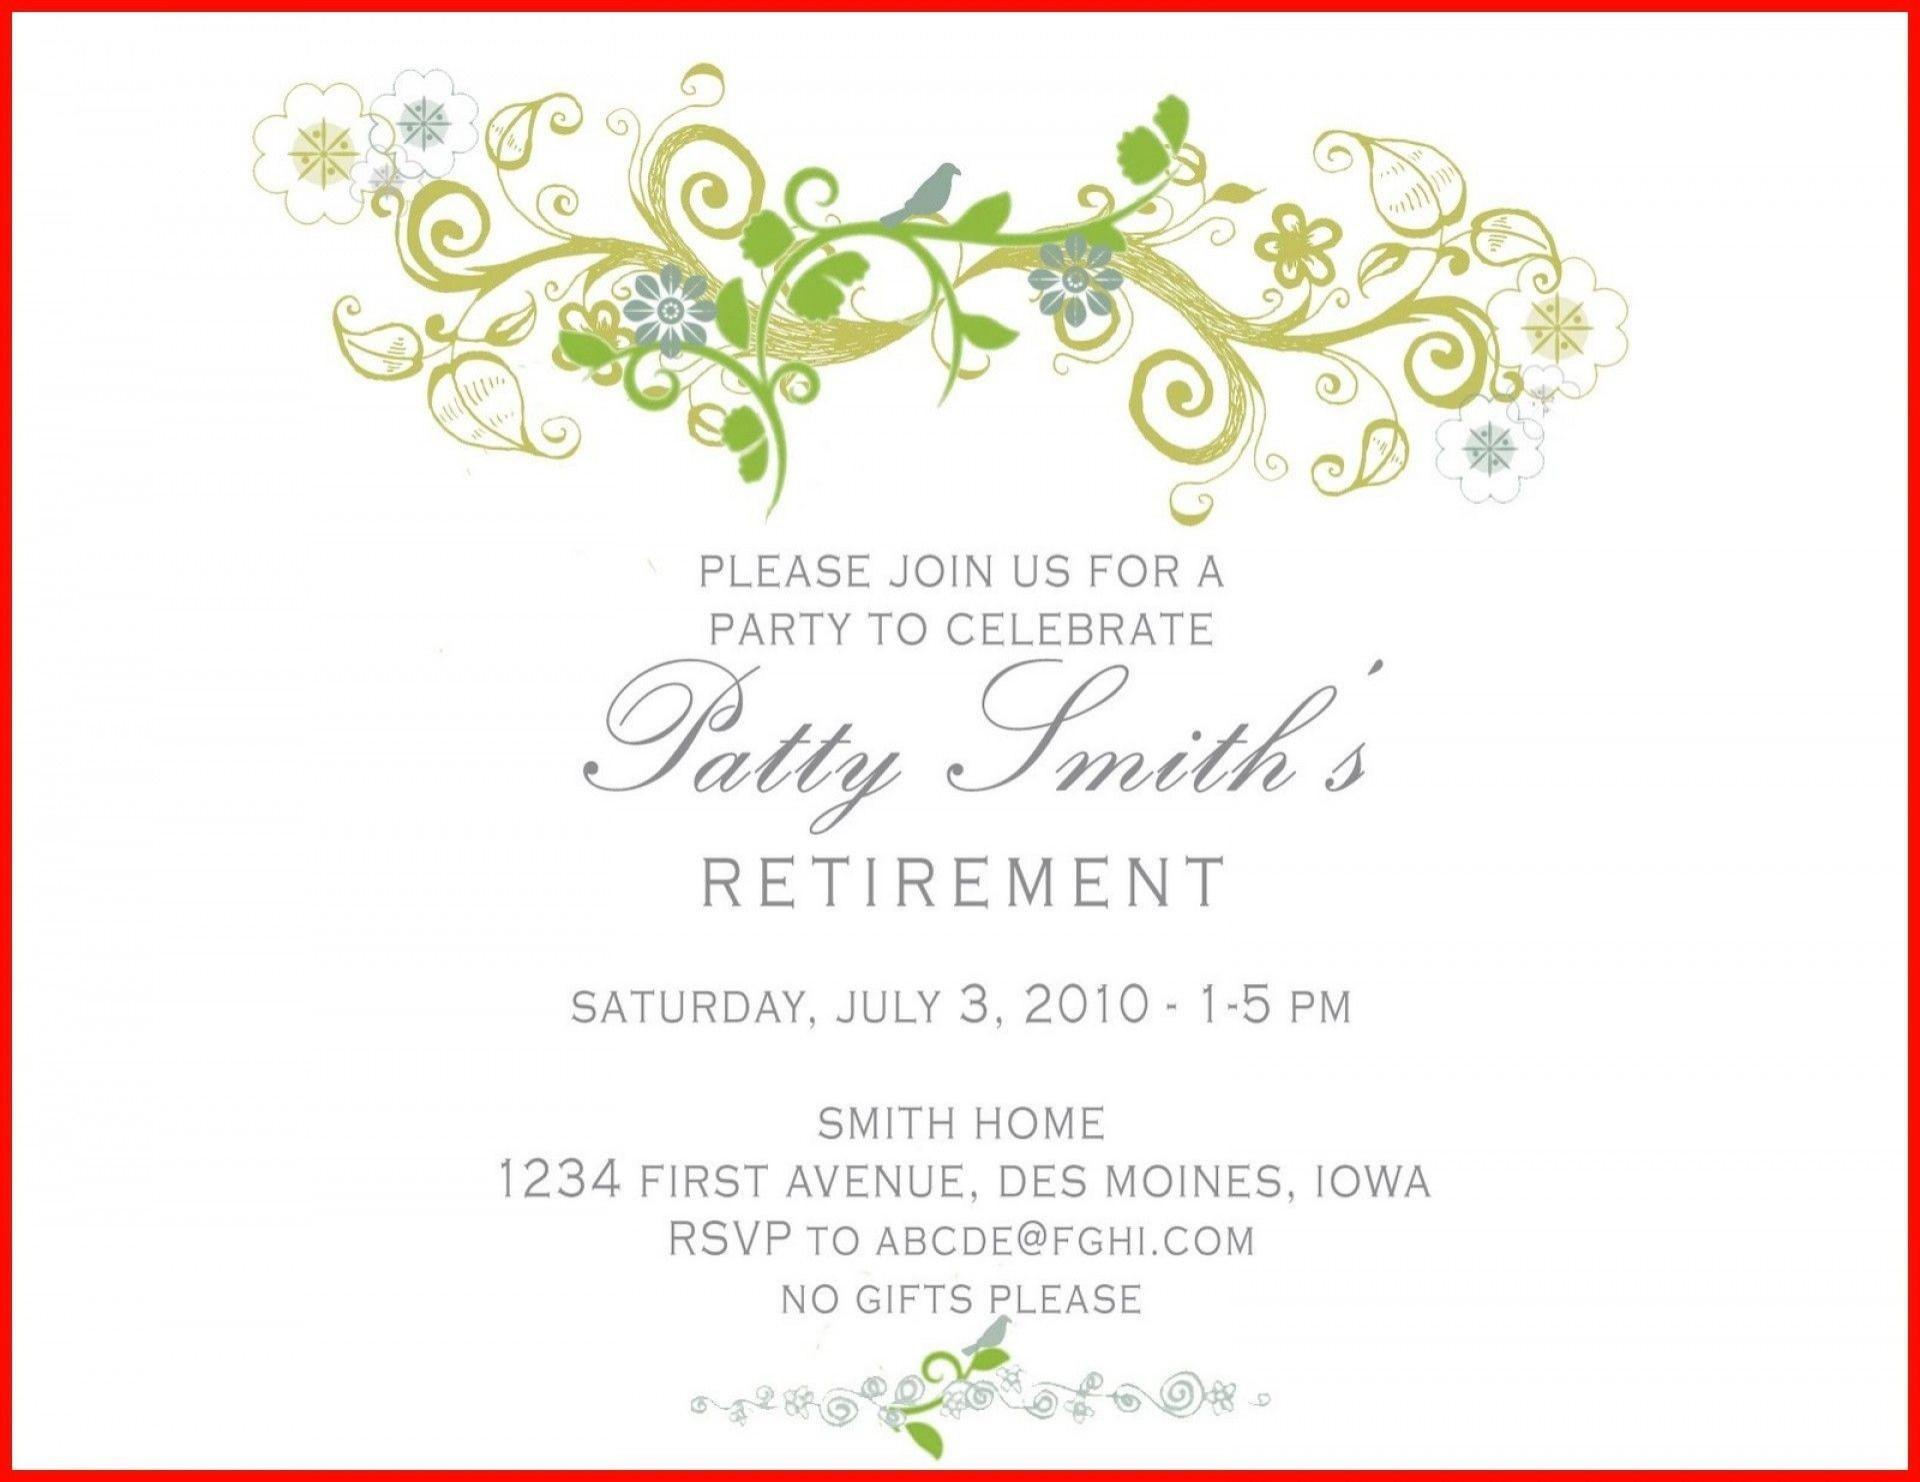 000 Impressive Retirement Party Invite Template High Definition  Invitation Online M Word Free1920